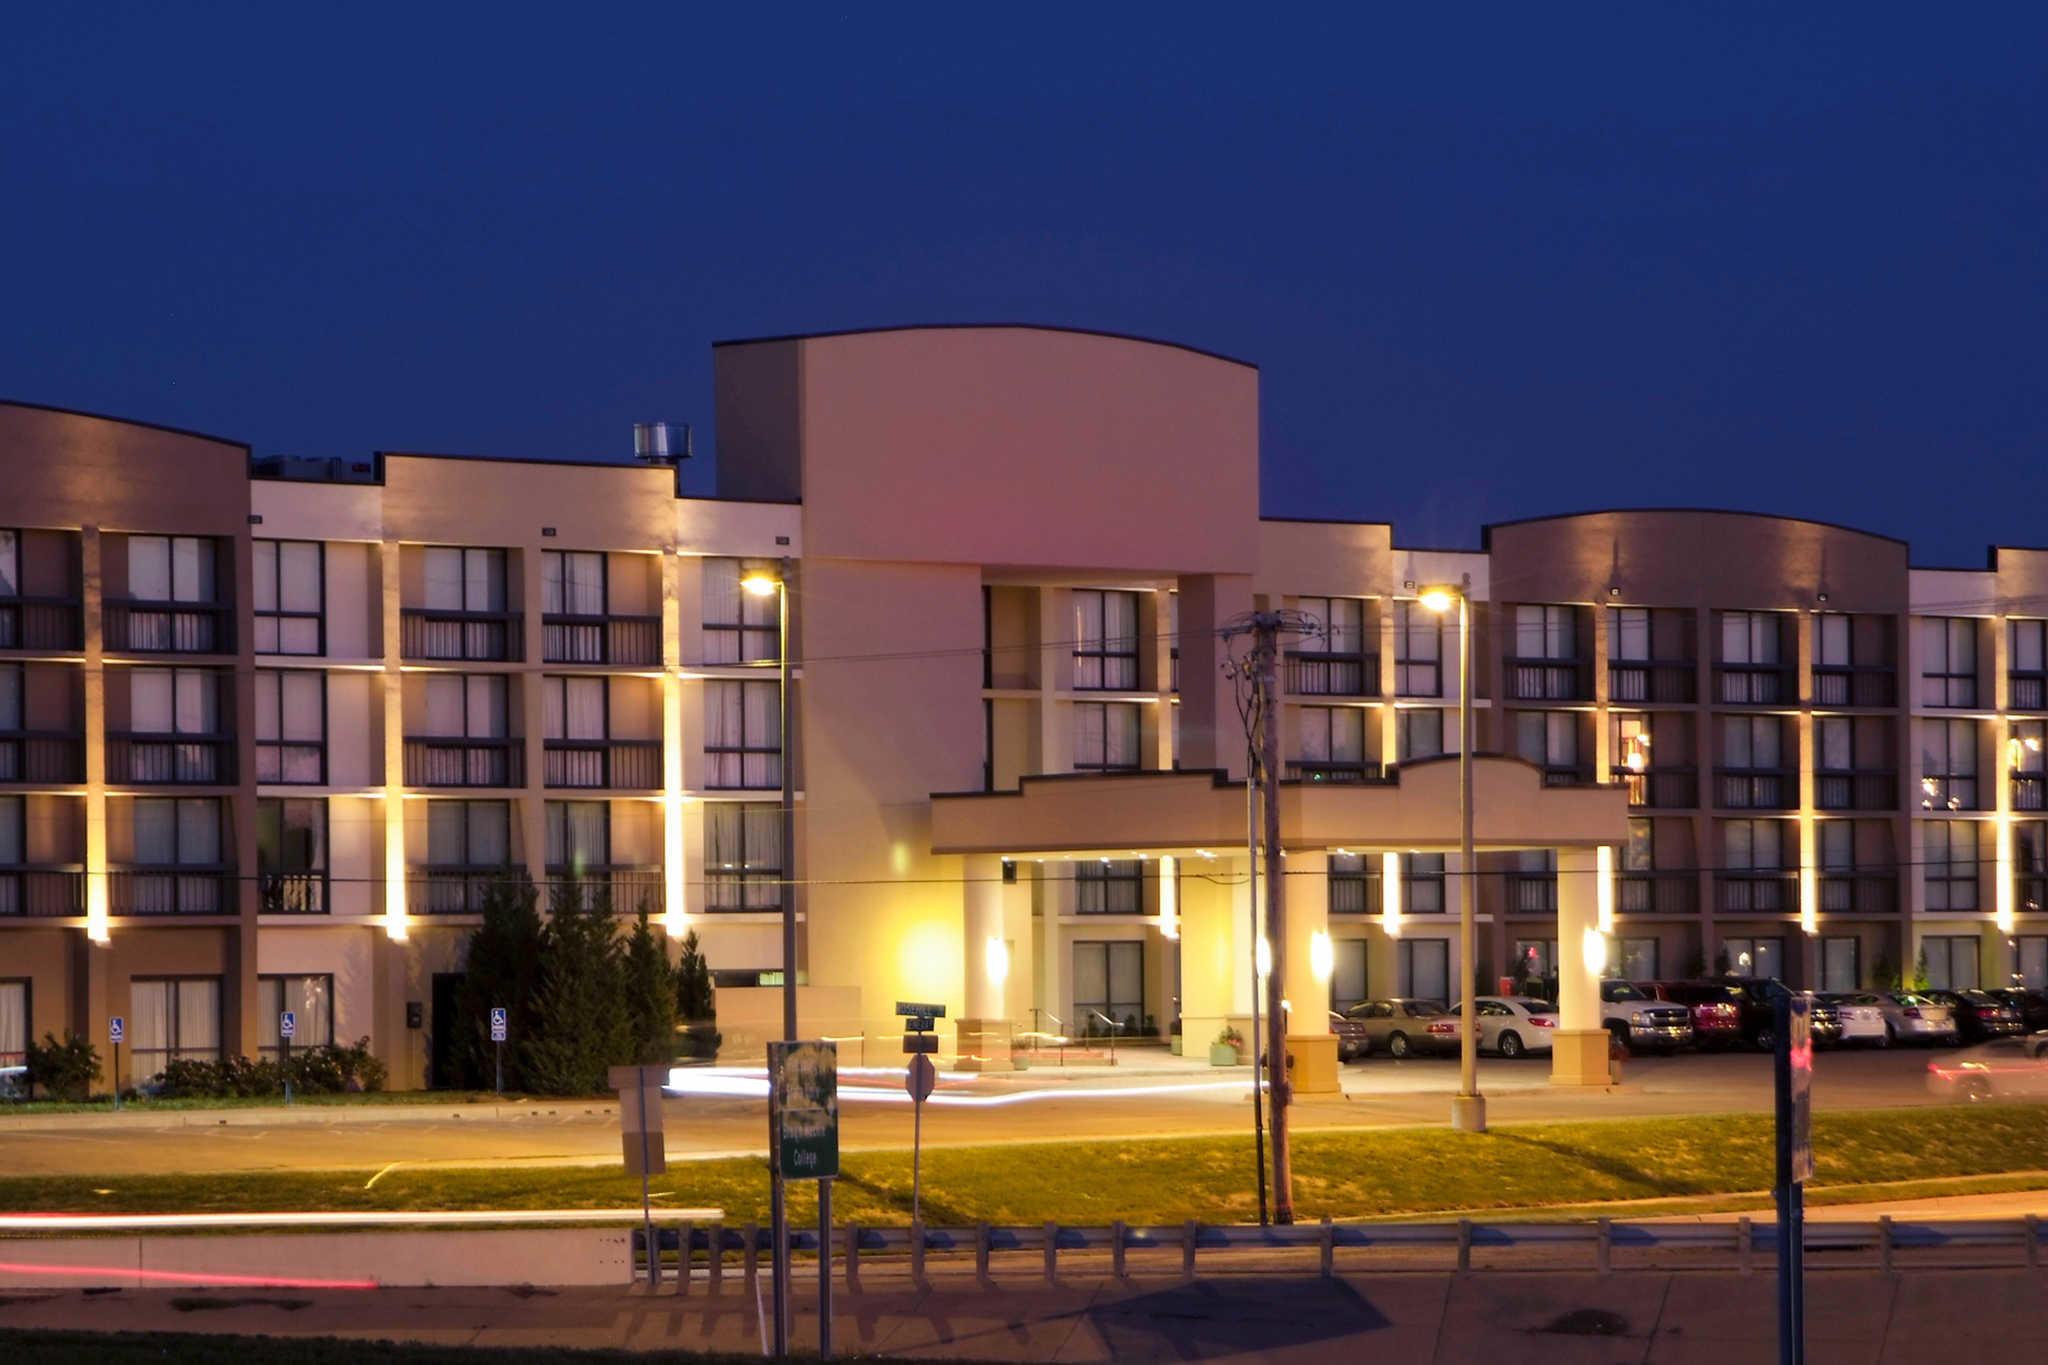 Clarion Hotel Kansas City Overland Park